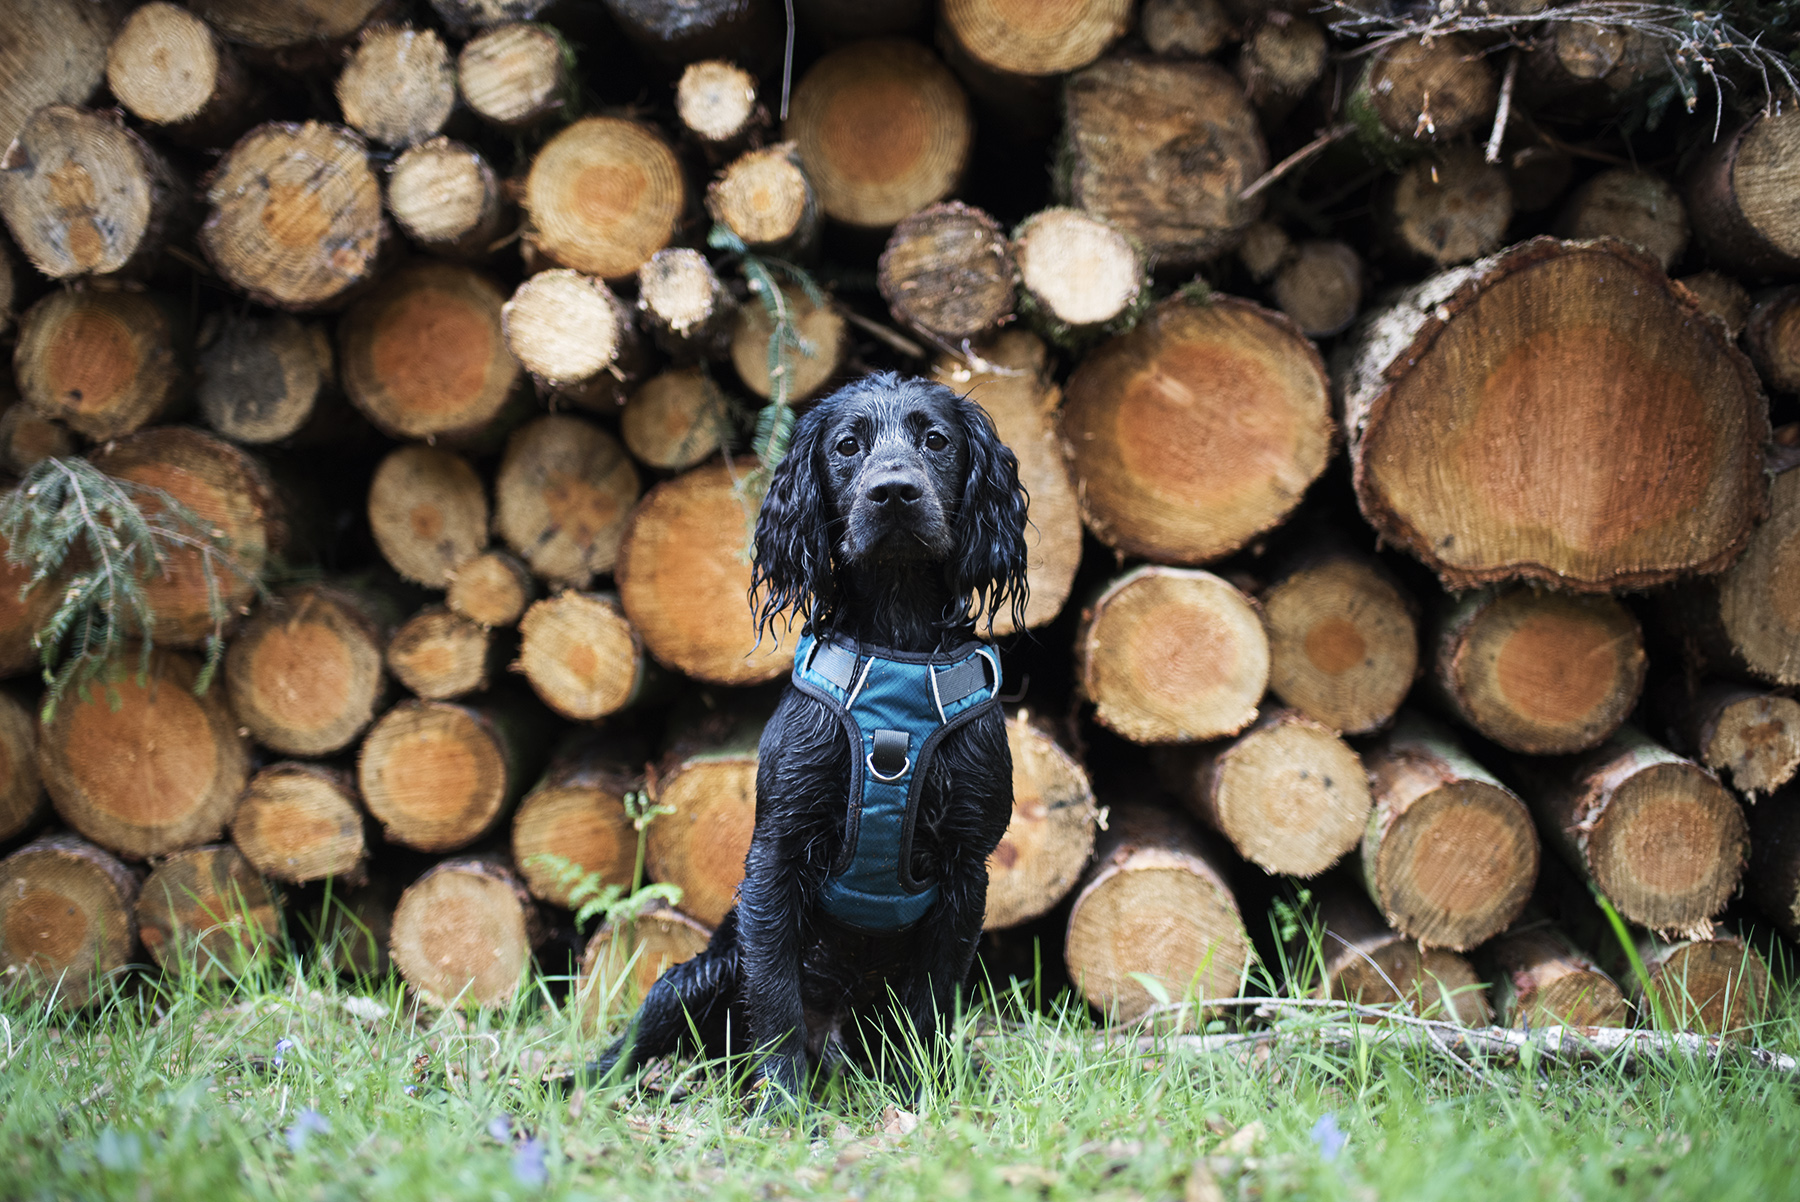 Embark Adventure Harness | The Cornish Dog